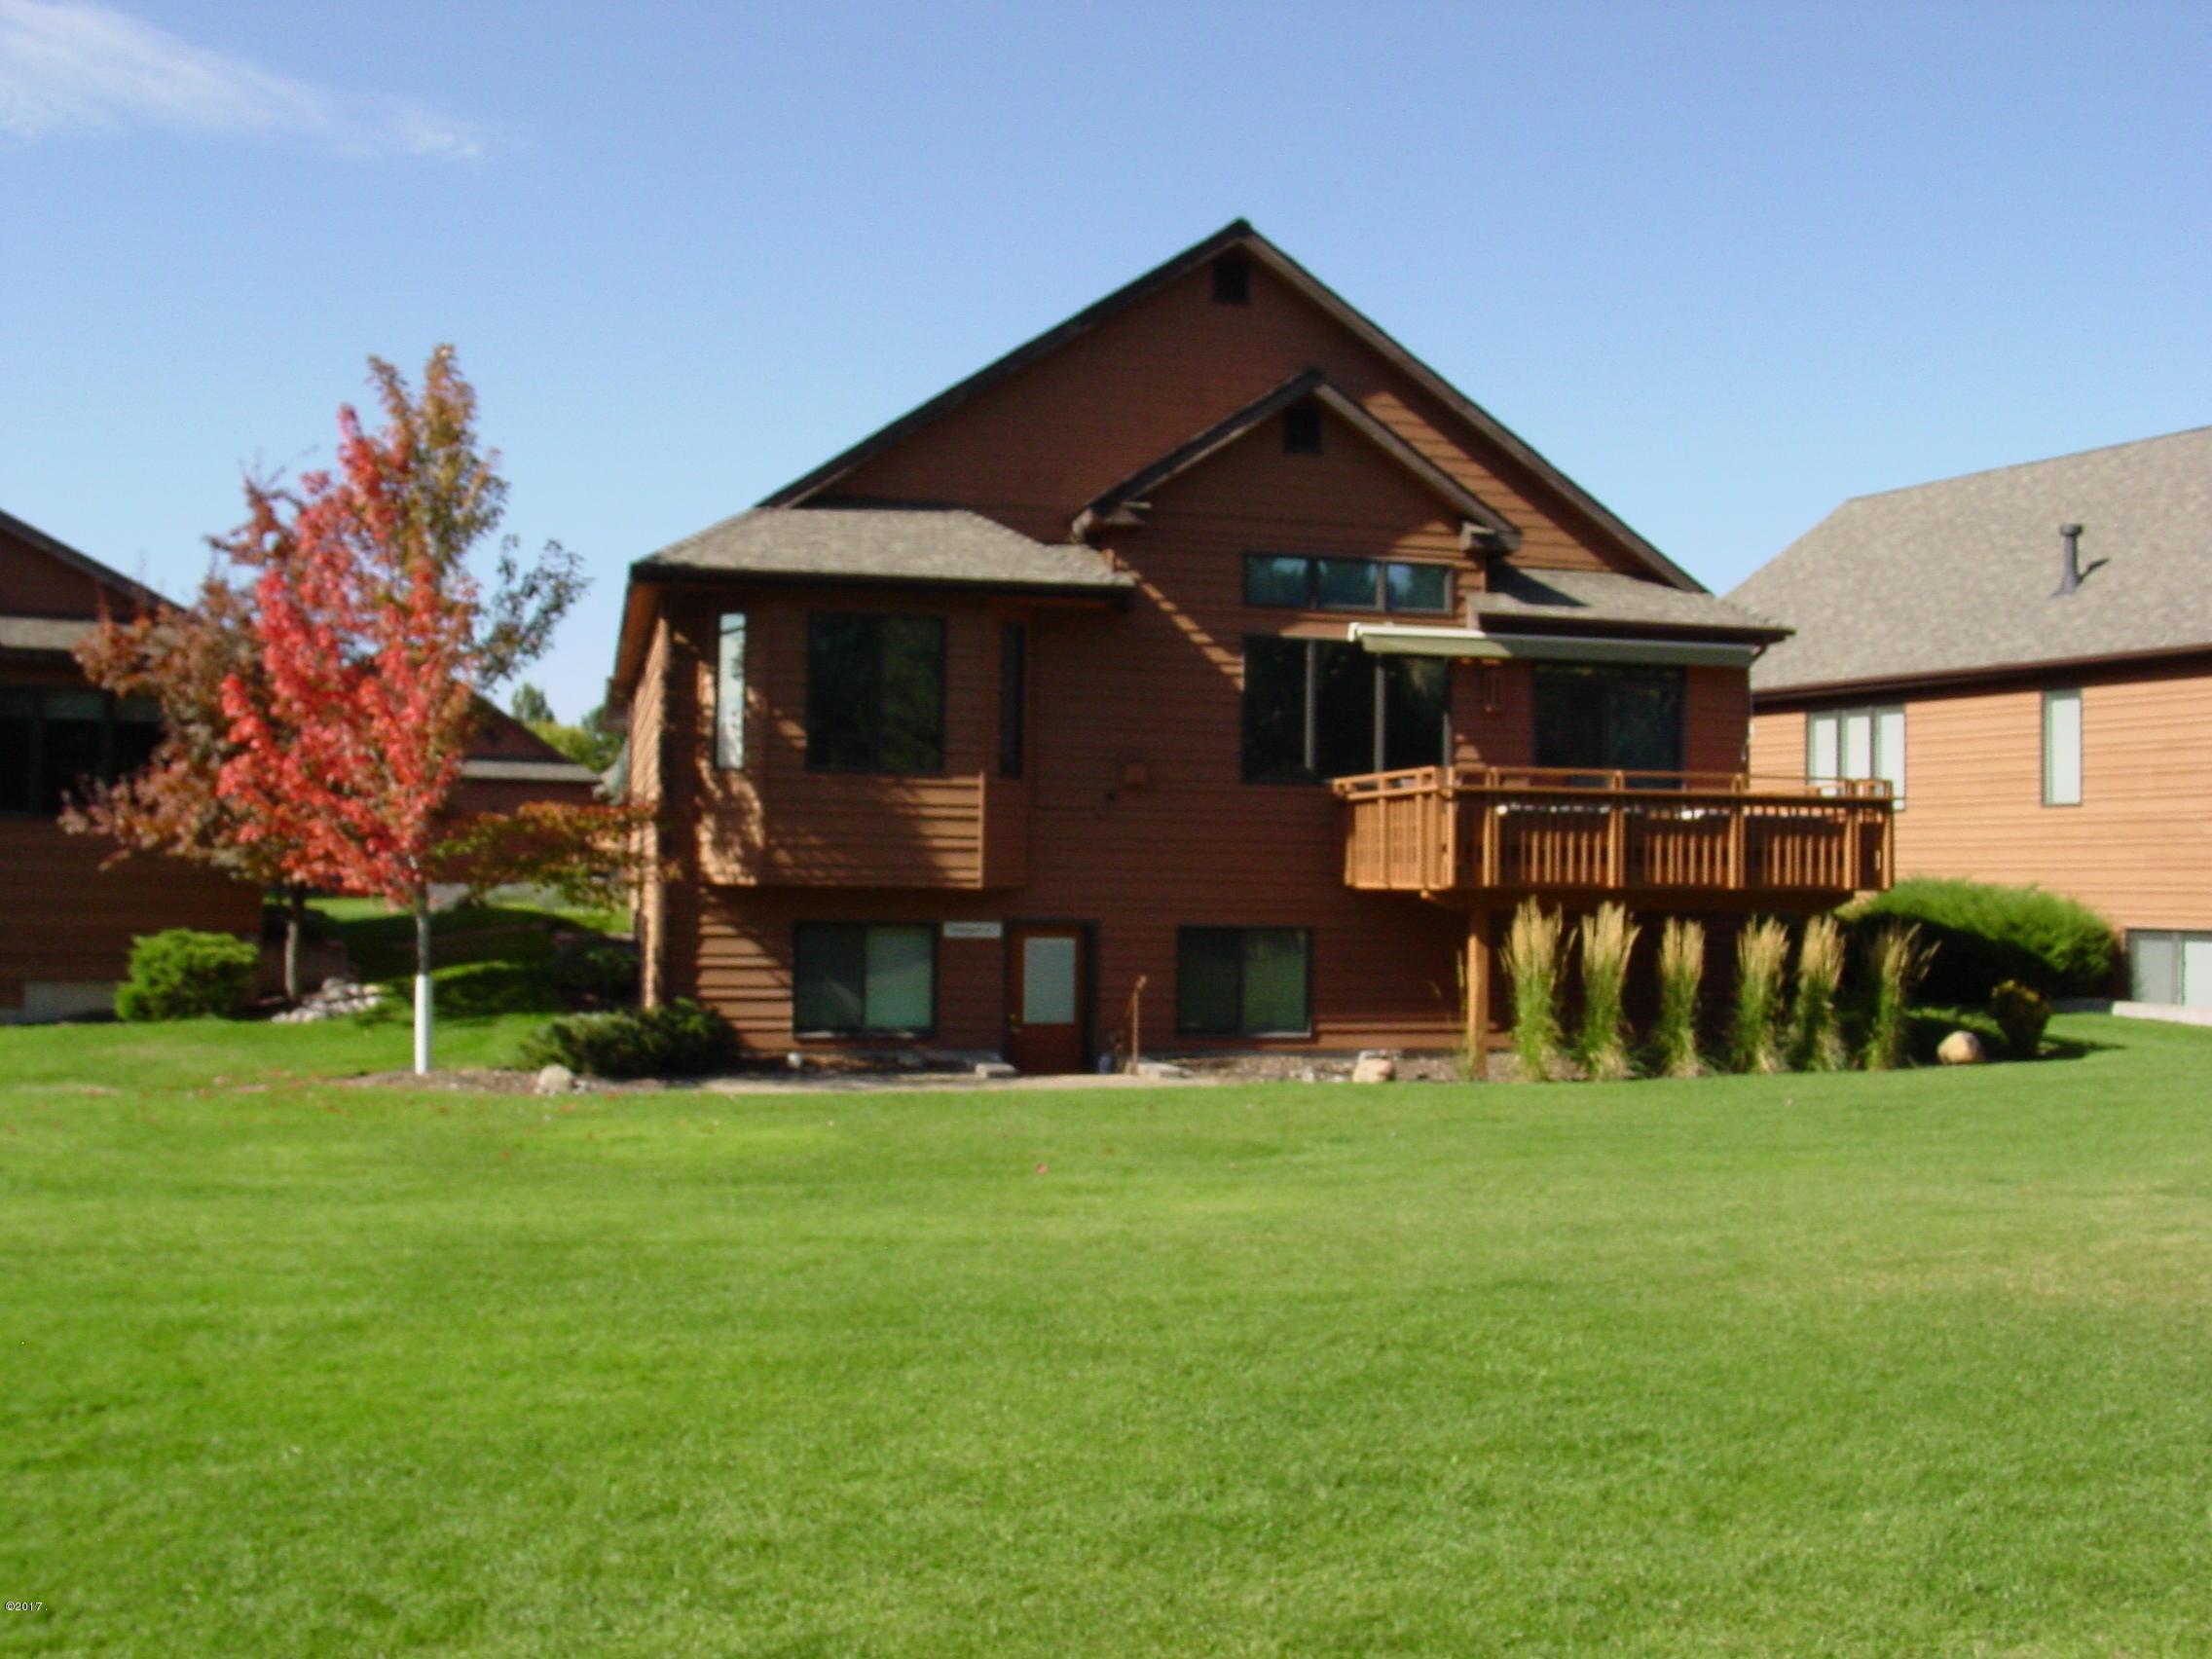 Single Family Home for Sale at 5 Brookside Way 5 Brookside Way Missoula, Montana 59802 United States